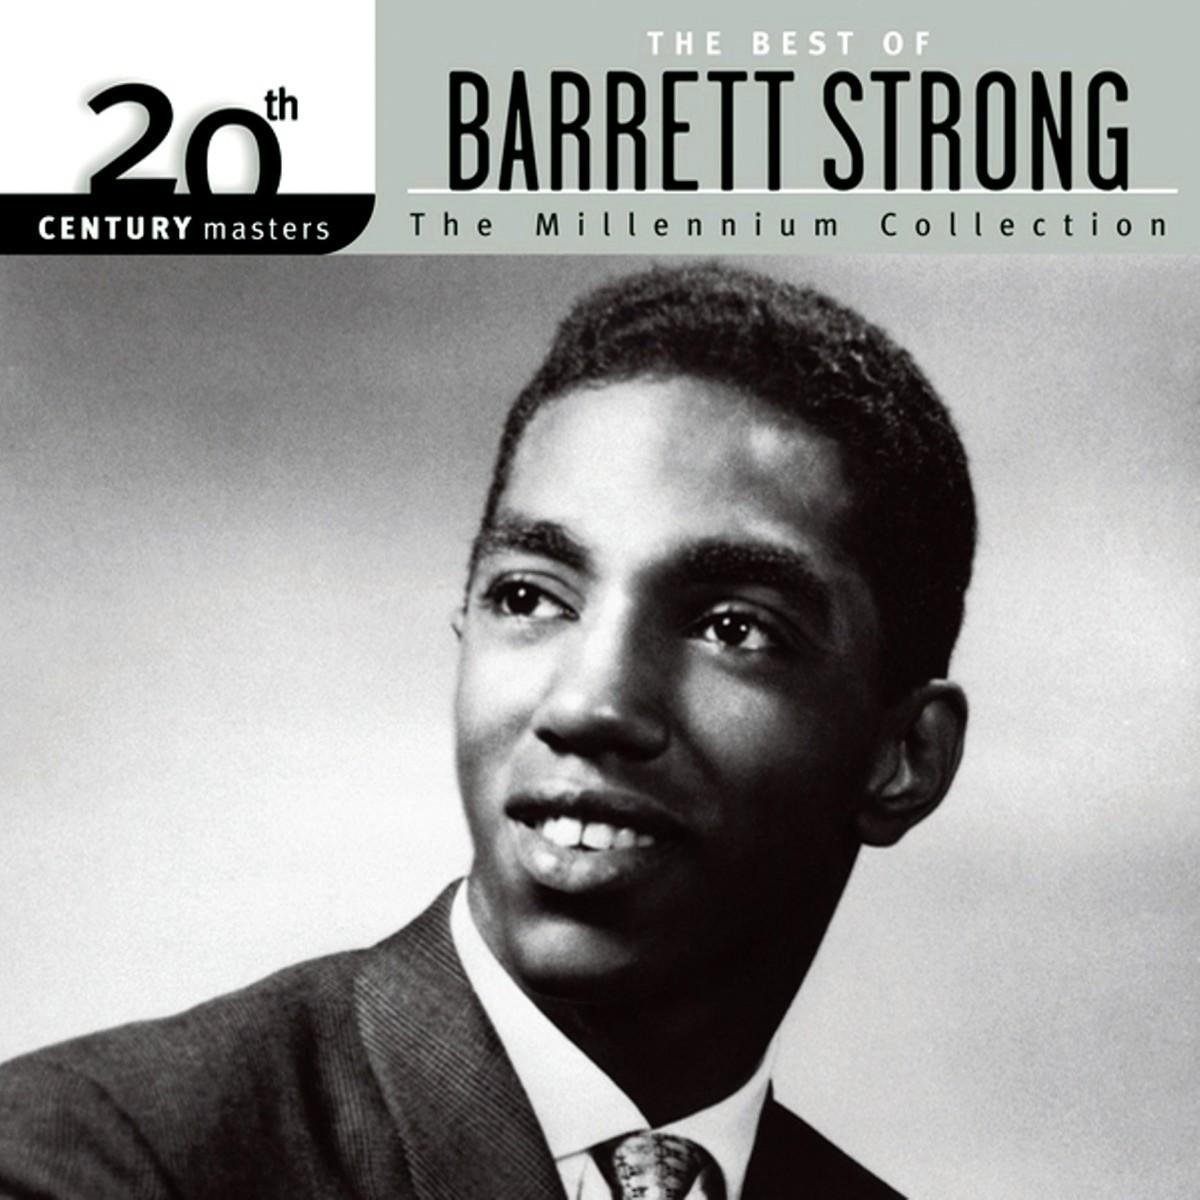 barrett_strong